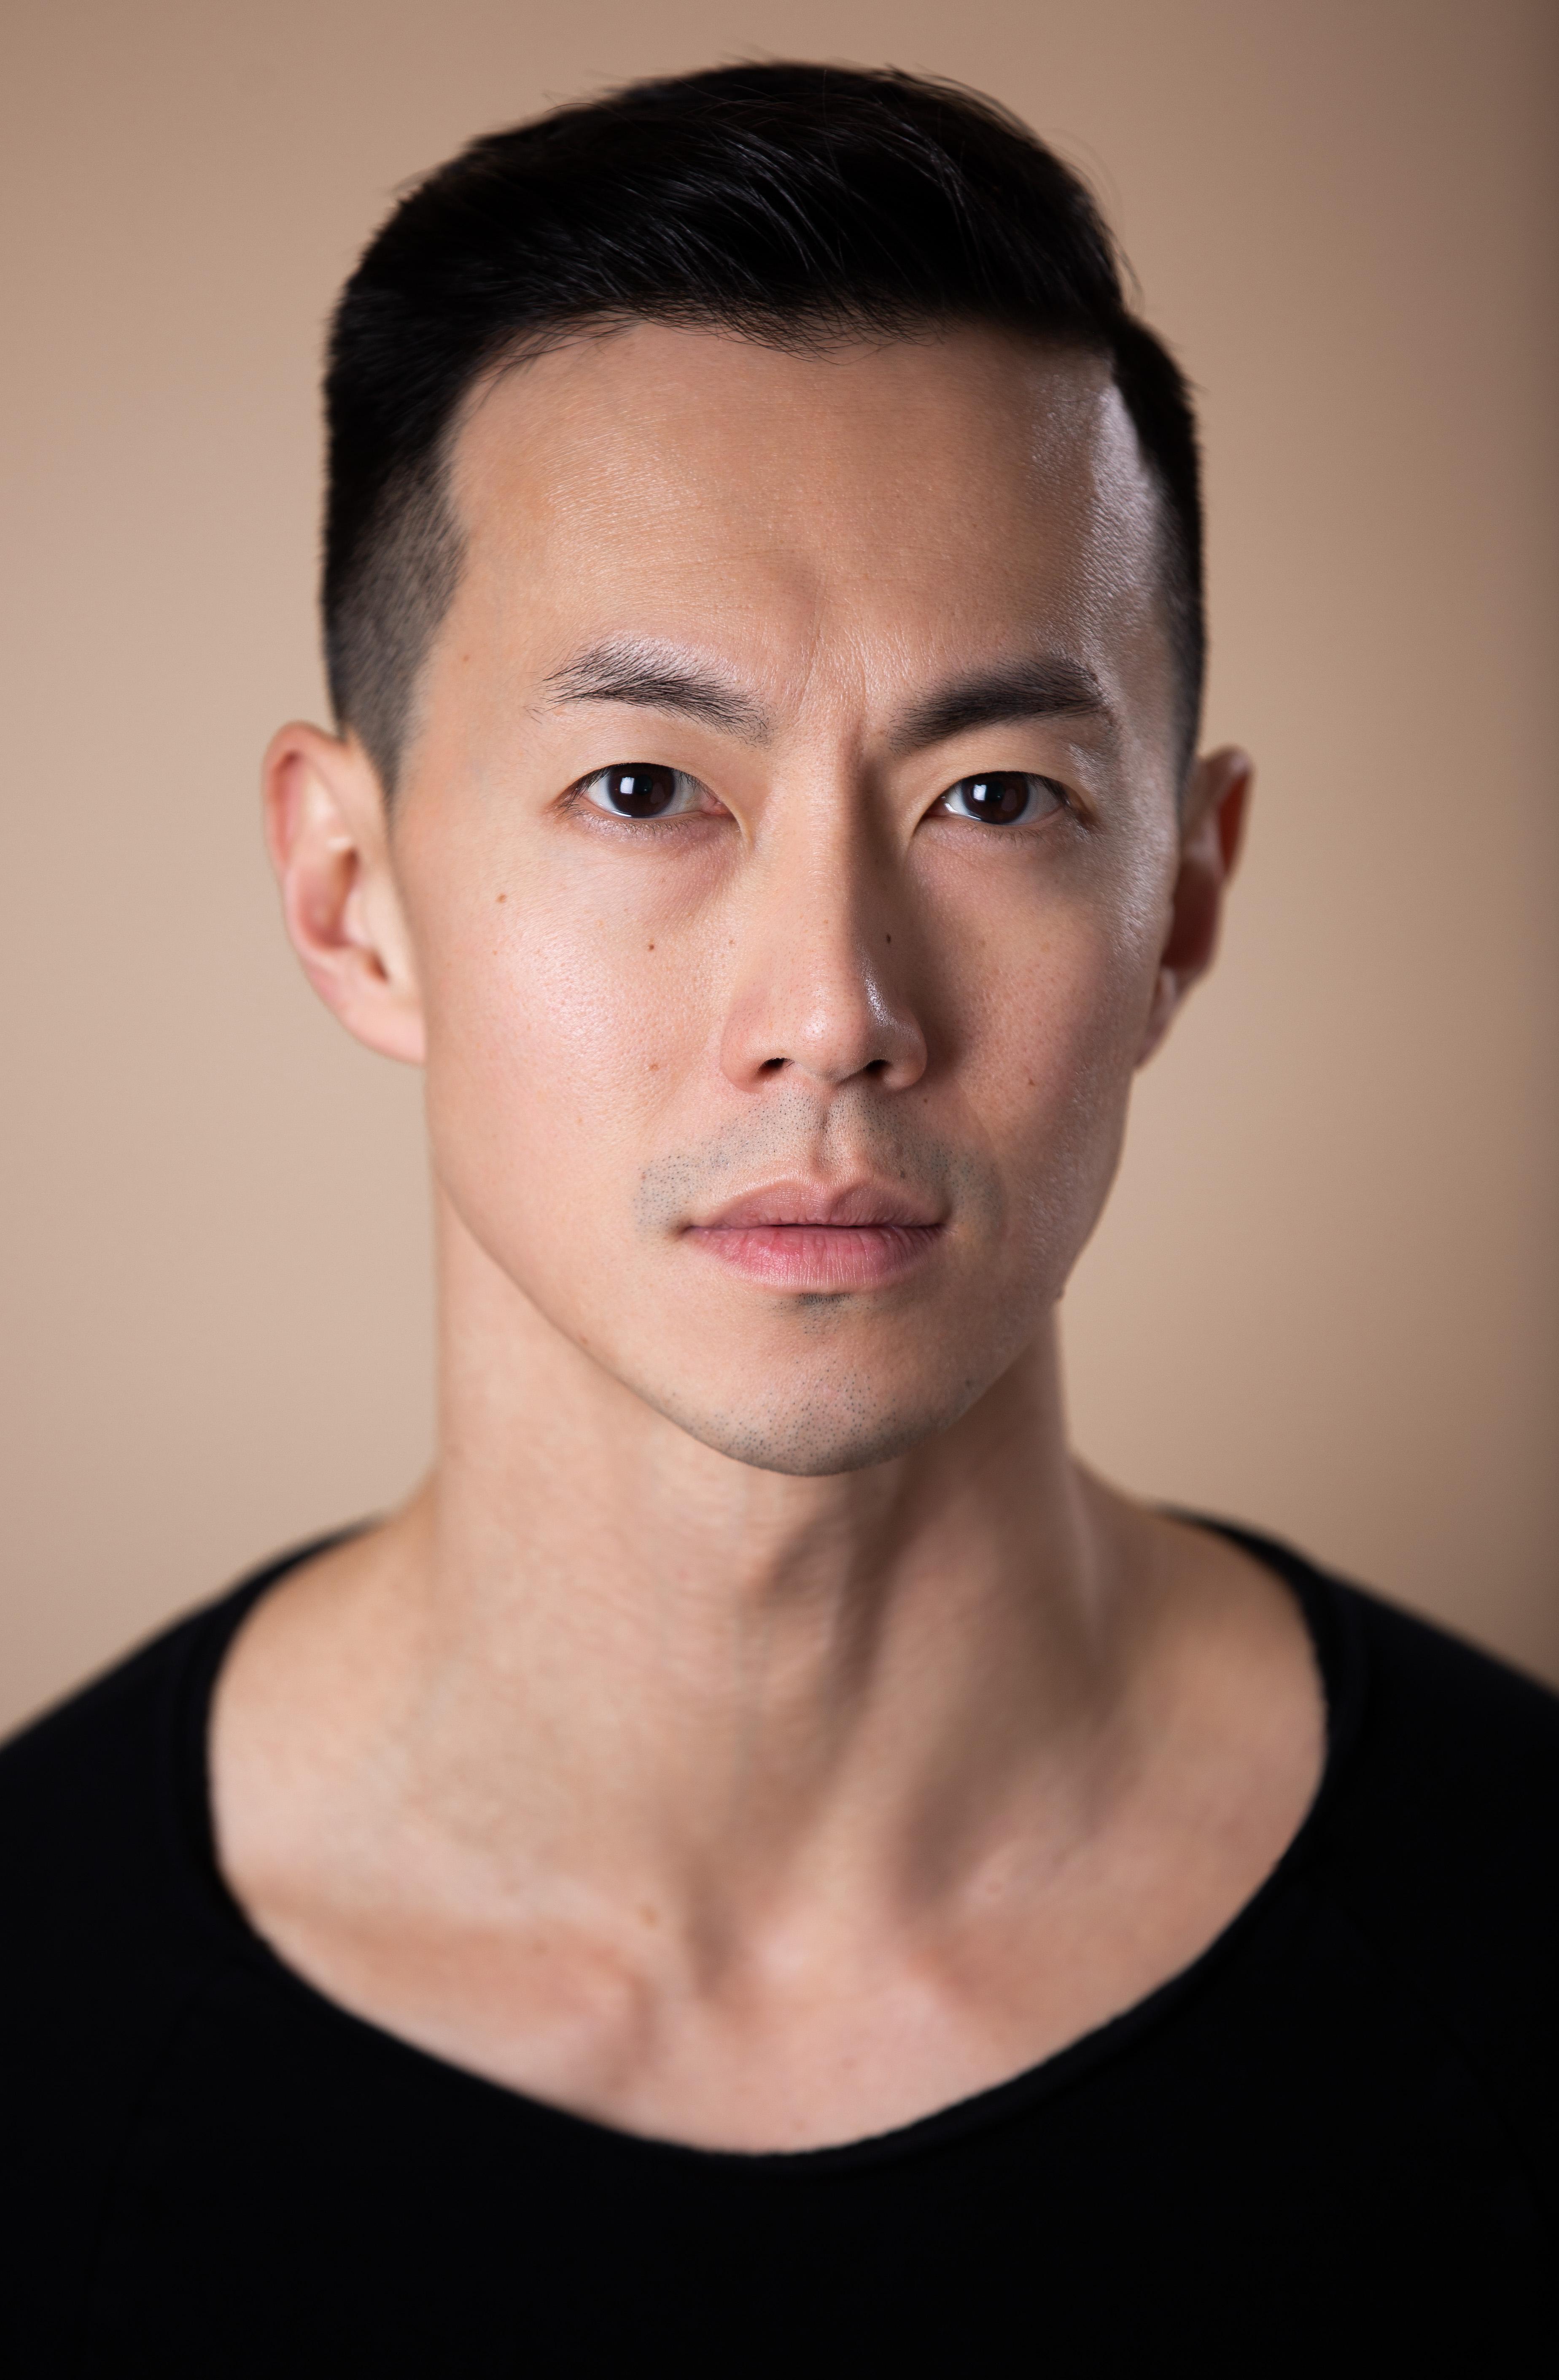 Actor Headshot | 2020